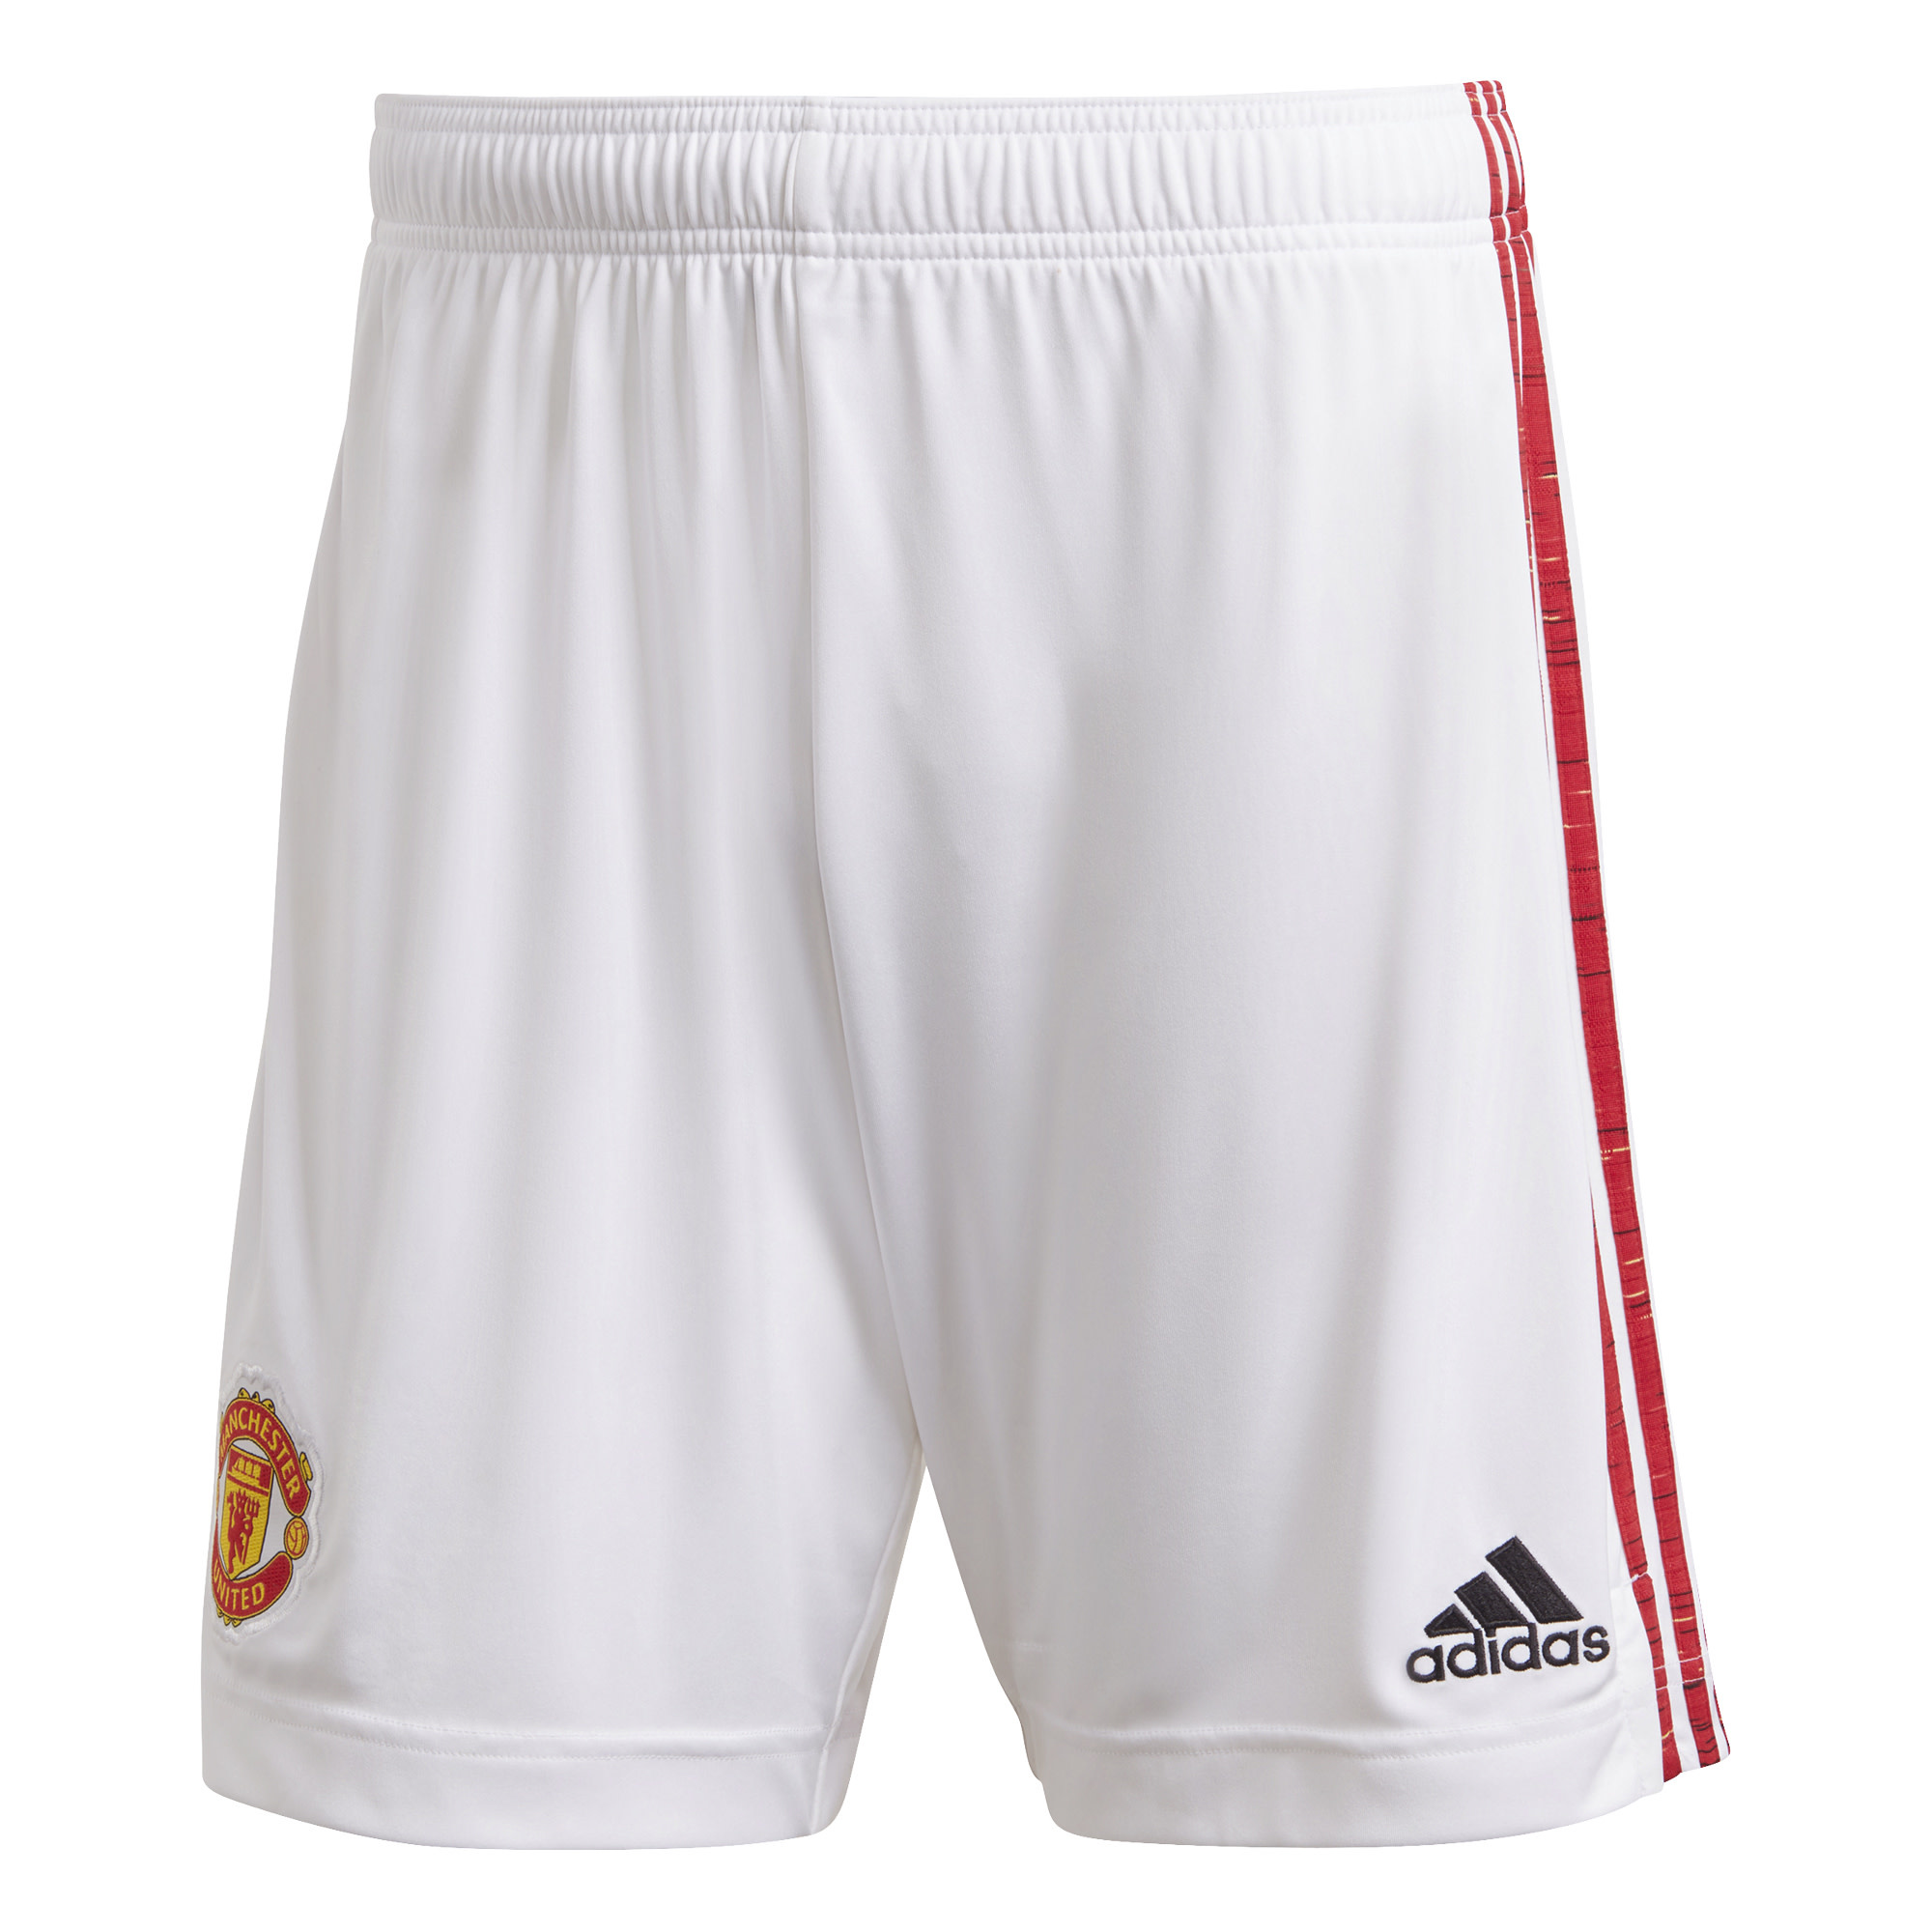 Adidas ADIDAS Manchester United Home Short '20-'21